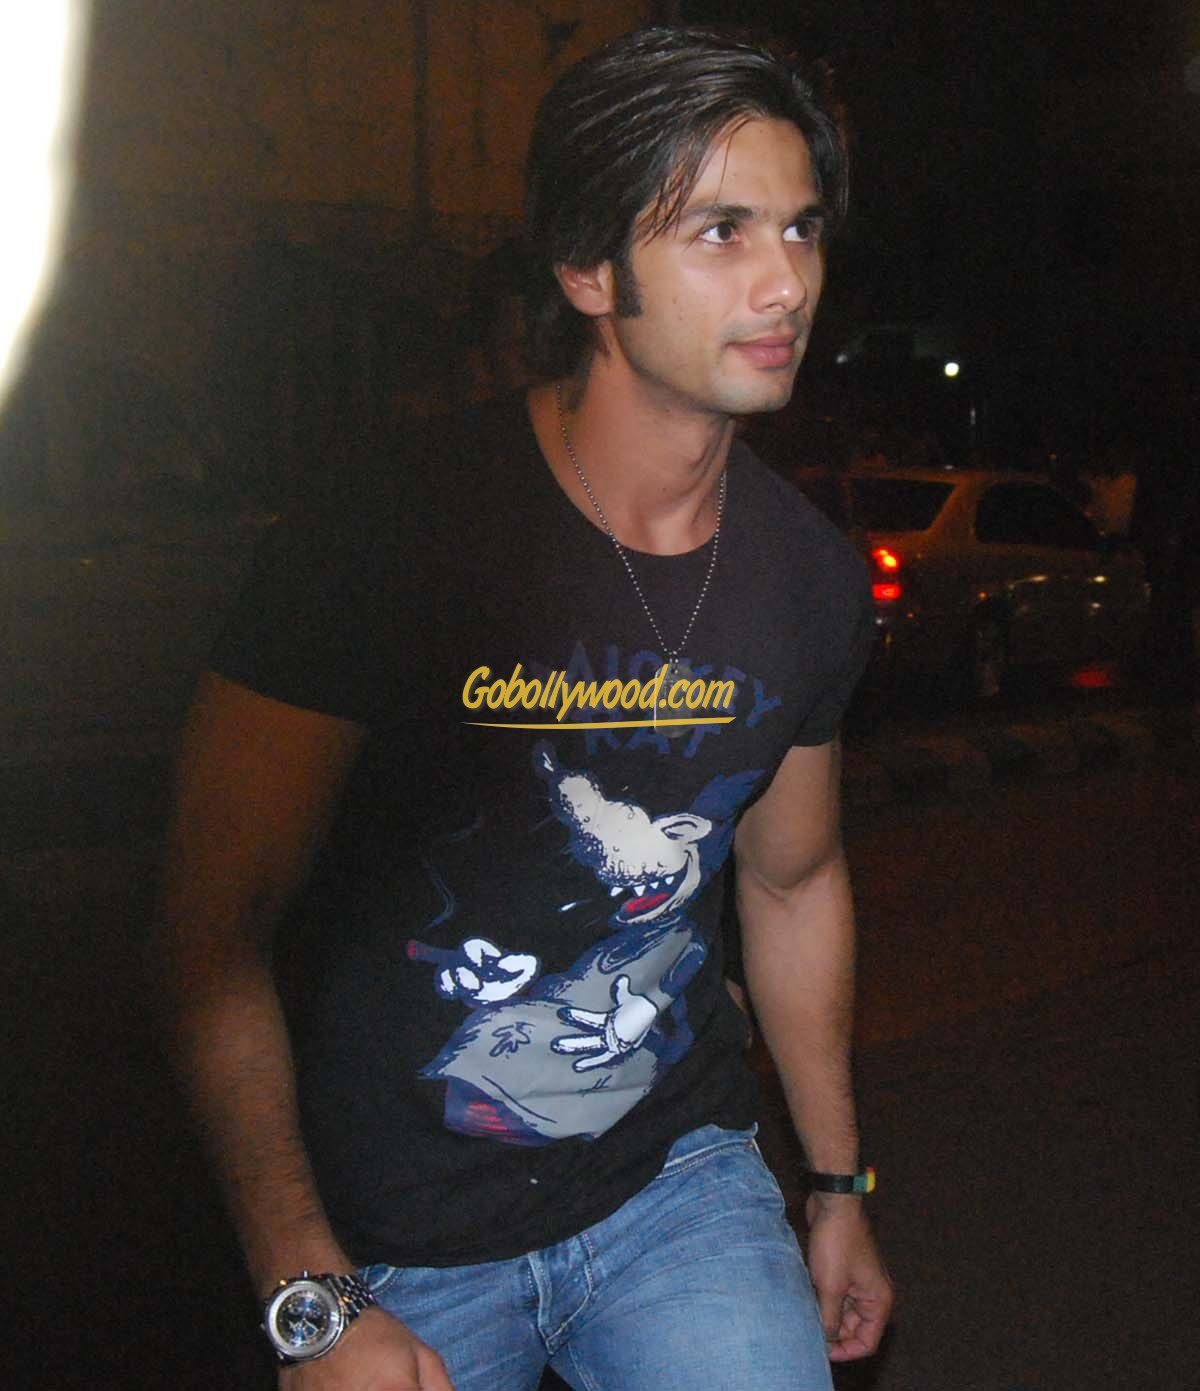 صور شاهيد قبل وبعد Shahid-Kapoor-Hot-Body-Six-Packs-Pics-Pictures-Photos-Wallpapers-Photoshoot-Bollywood-Bold-Super-Star-Actor-News-Gossips-2010